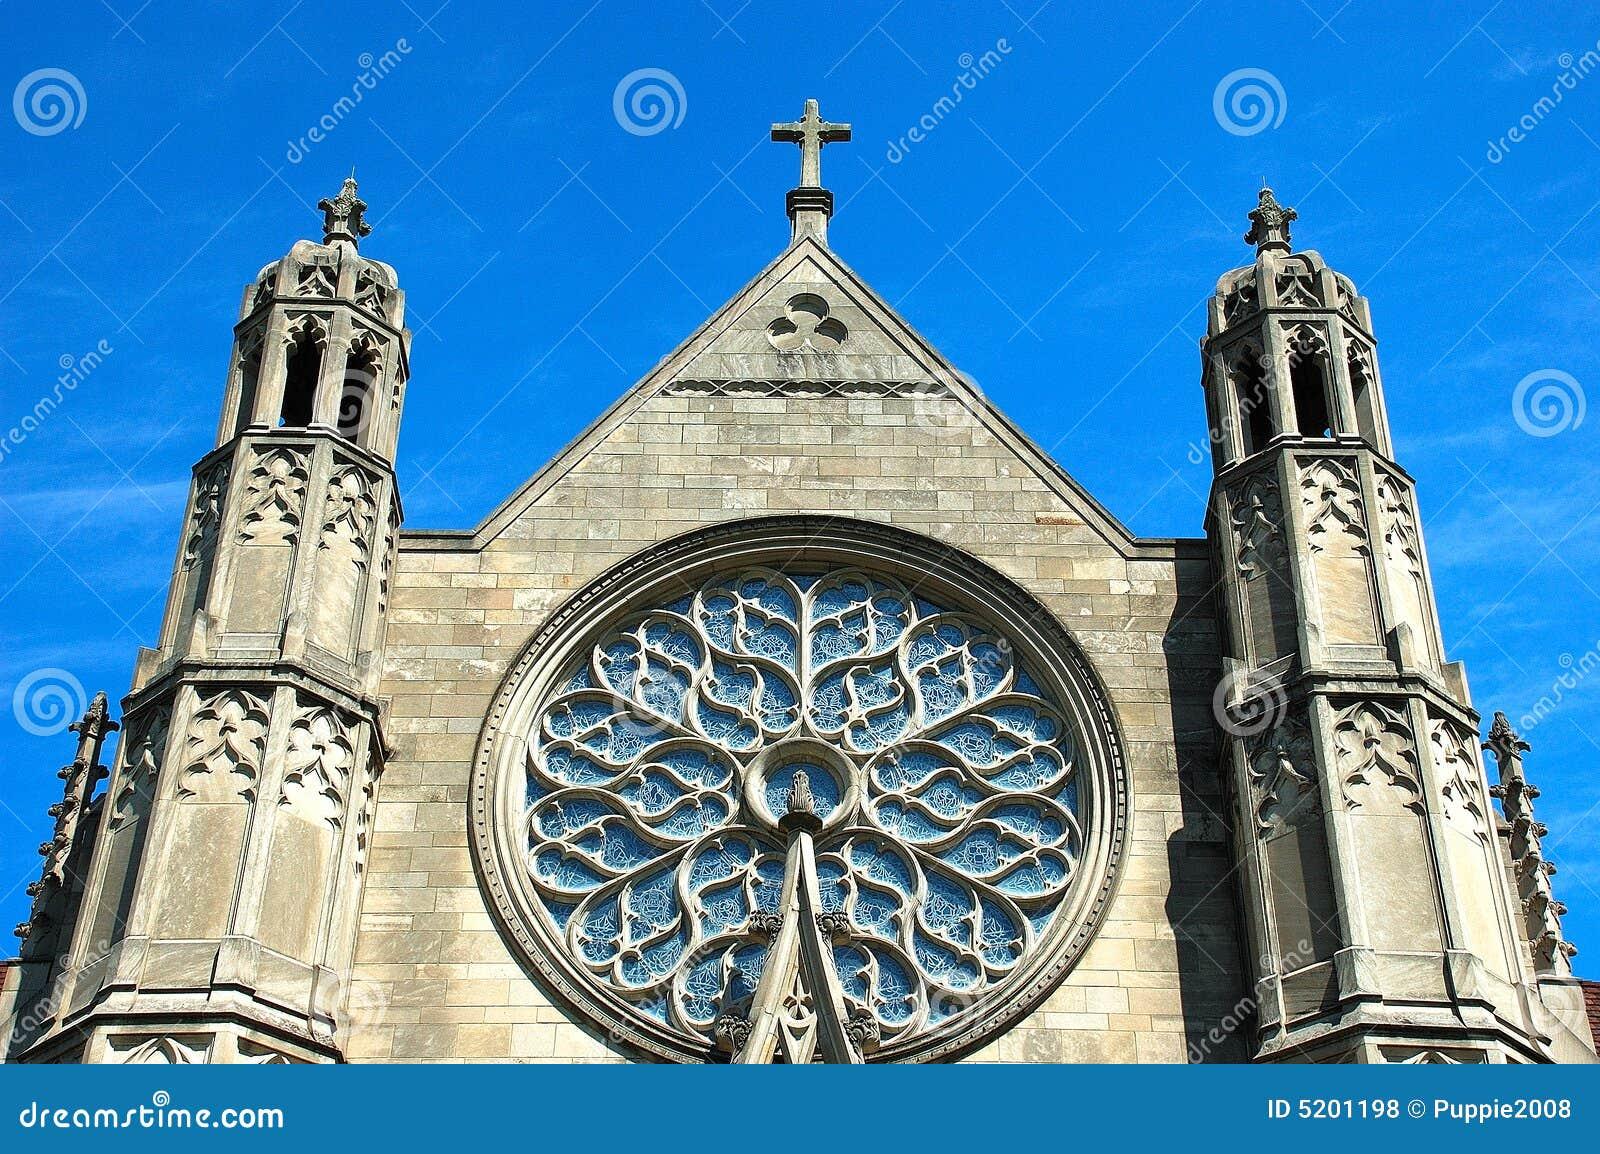 Gothic Architecture Stock Photo Image Of Hall Indianapolis